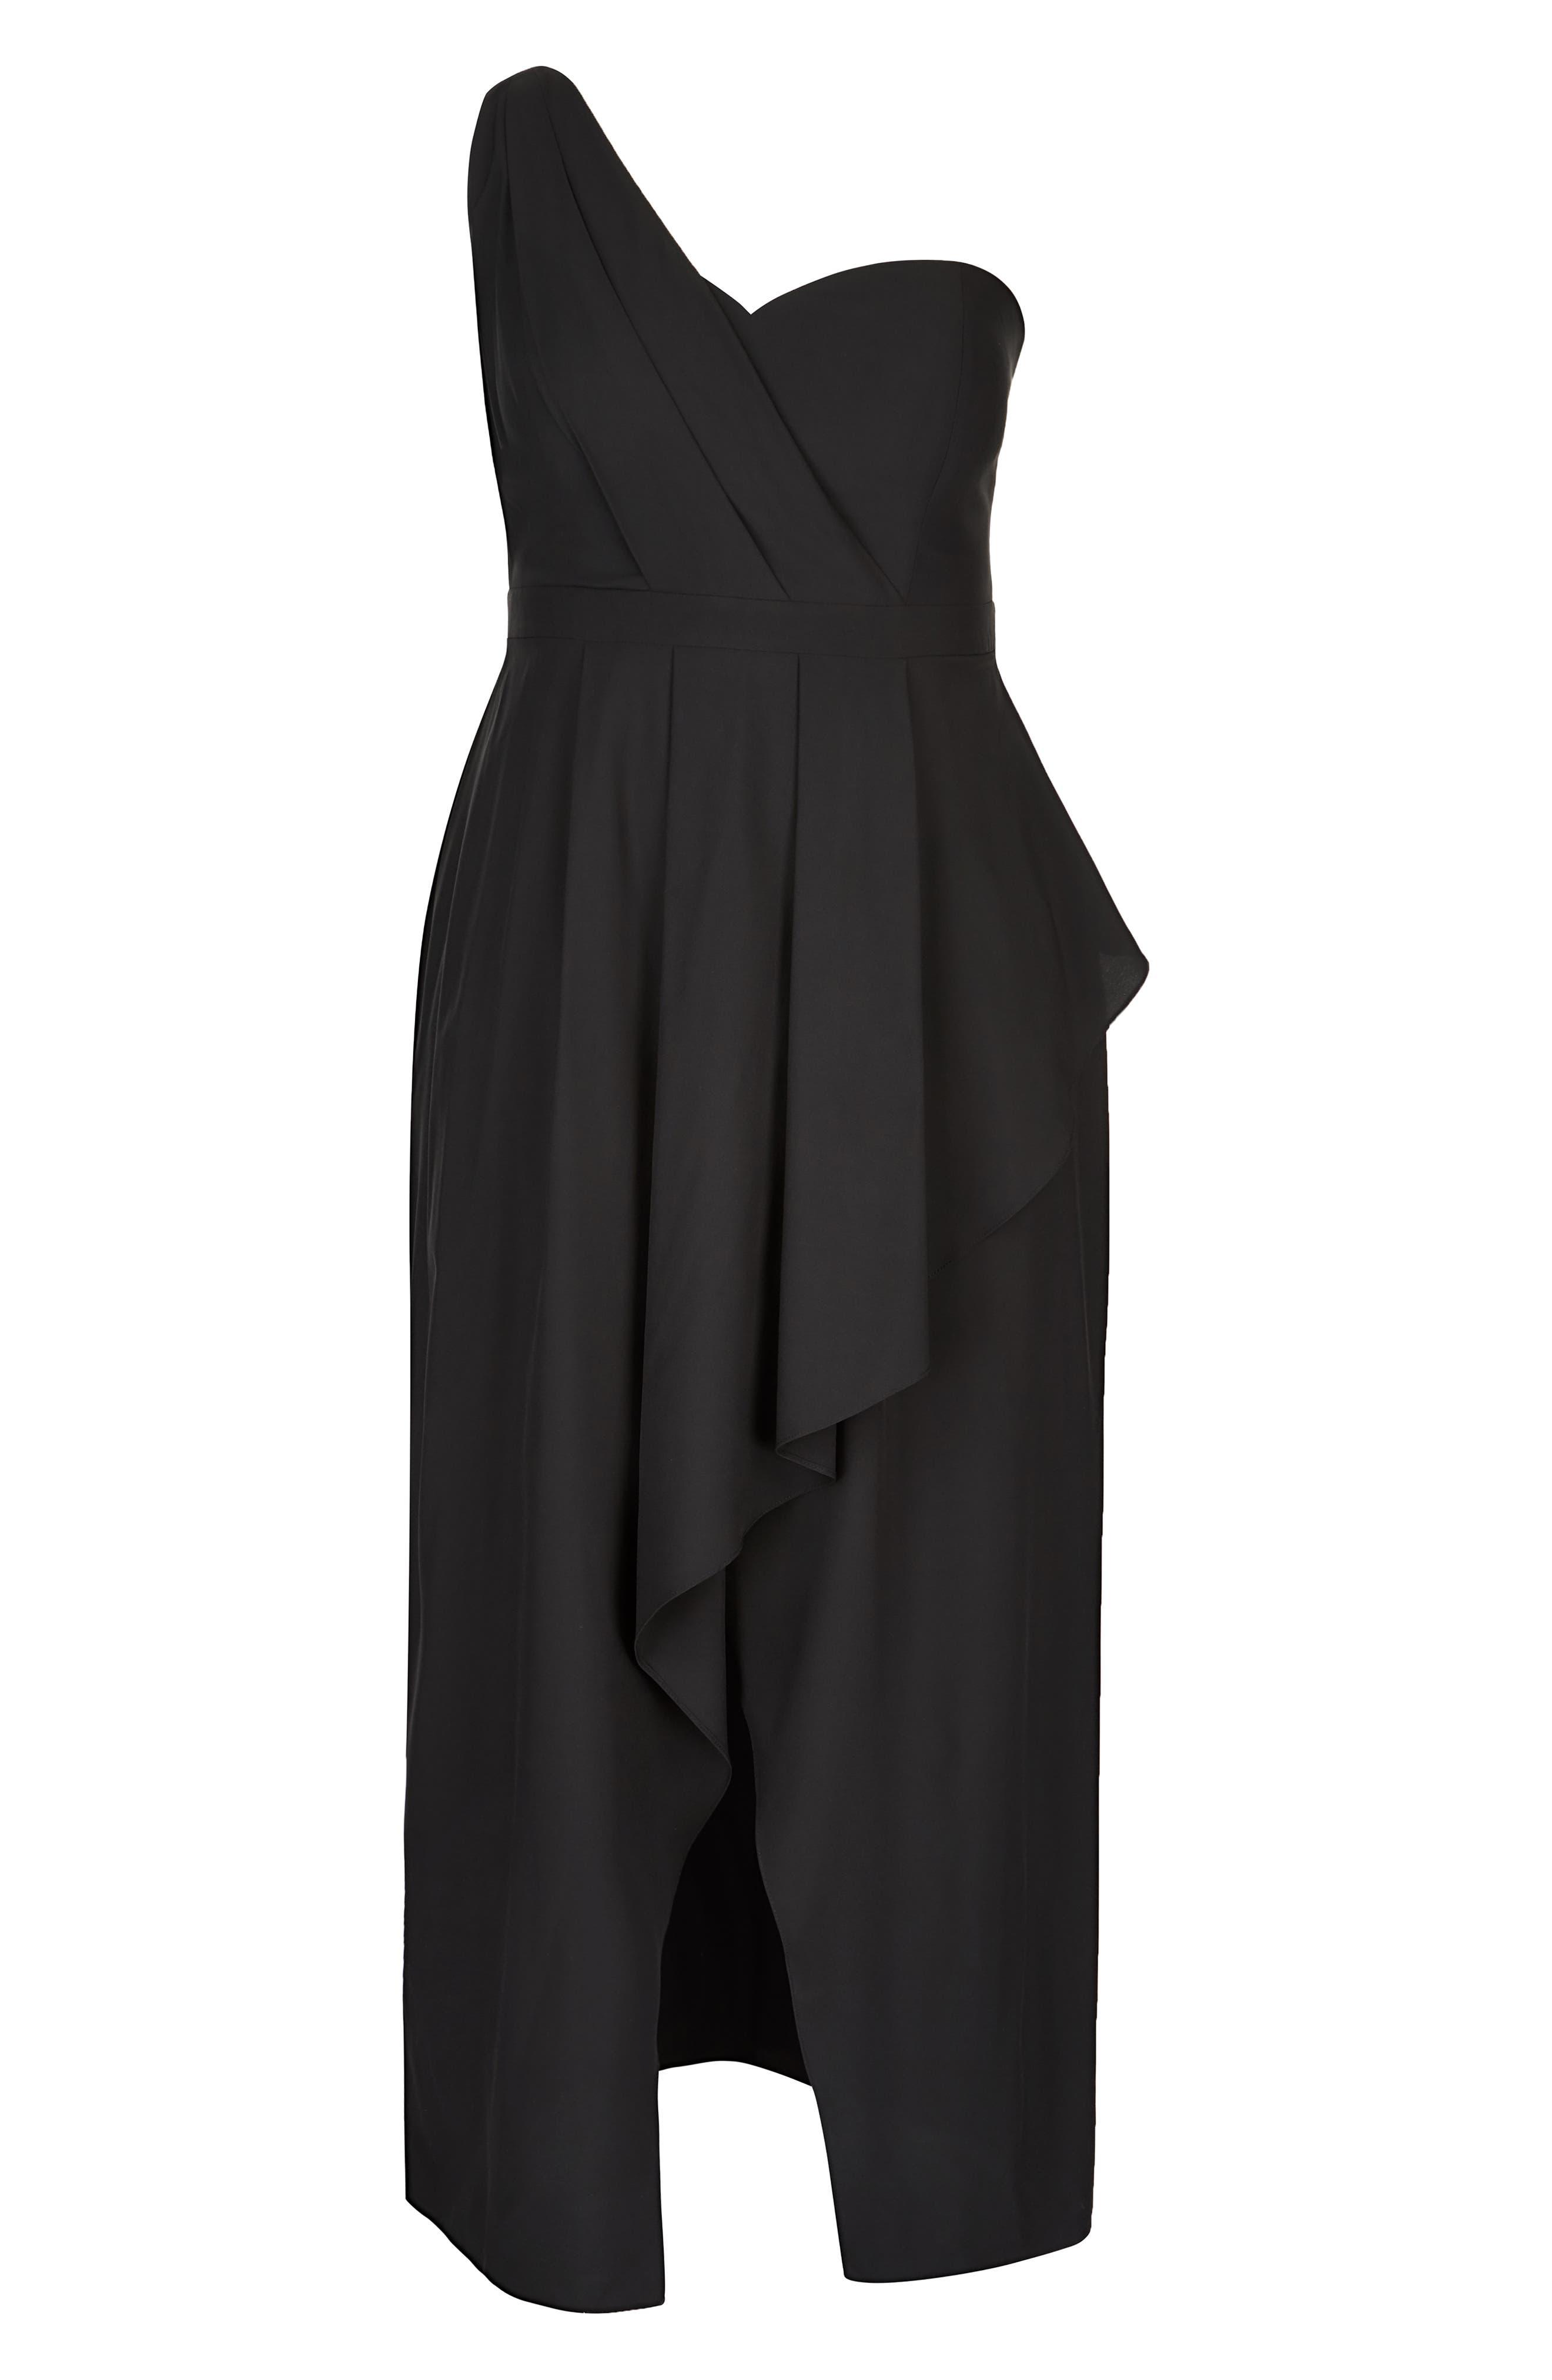 CITY CHIC, Allure One-Shoulder Maxi Dress, Alternate thumbnail 4, color, BLACK